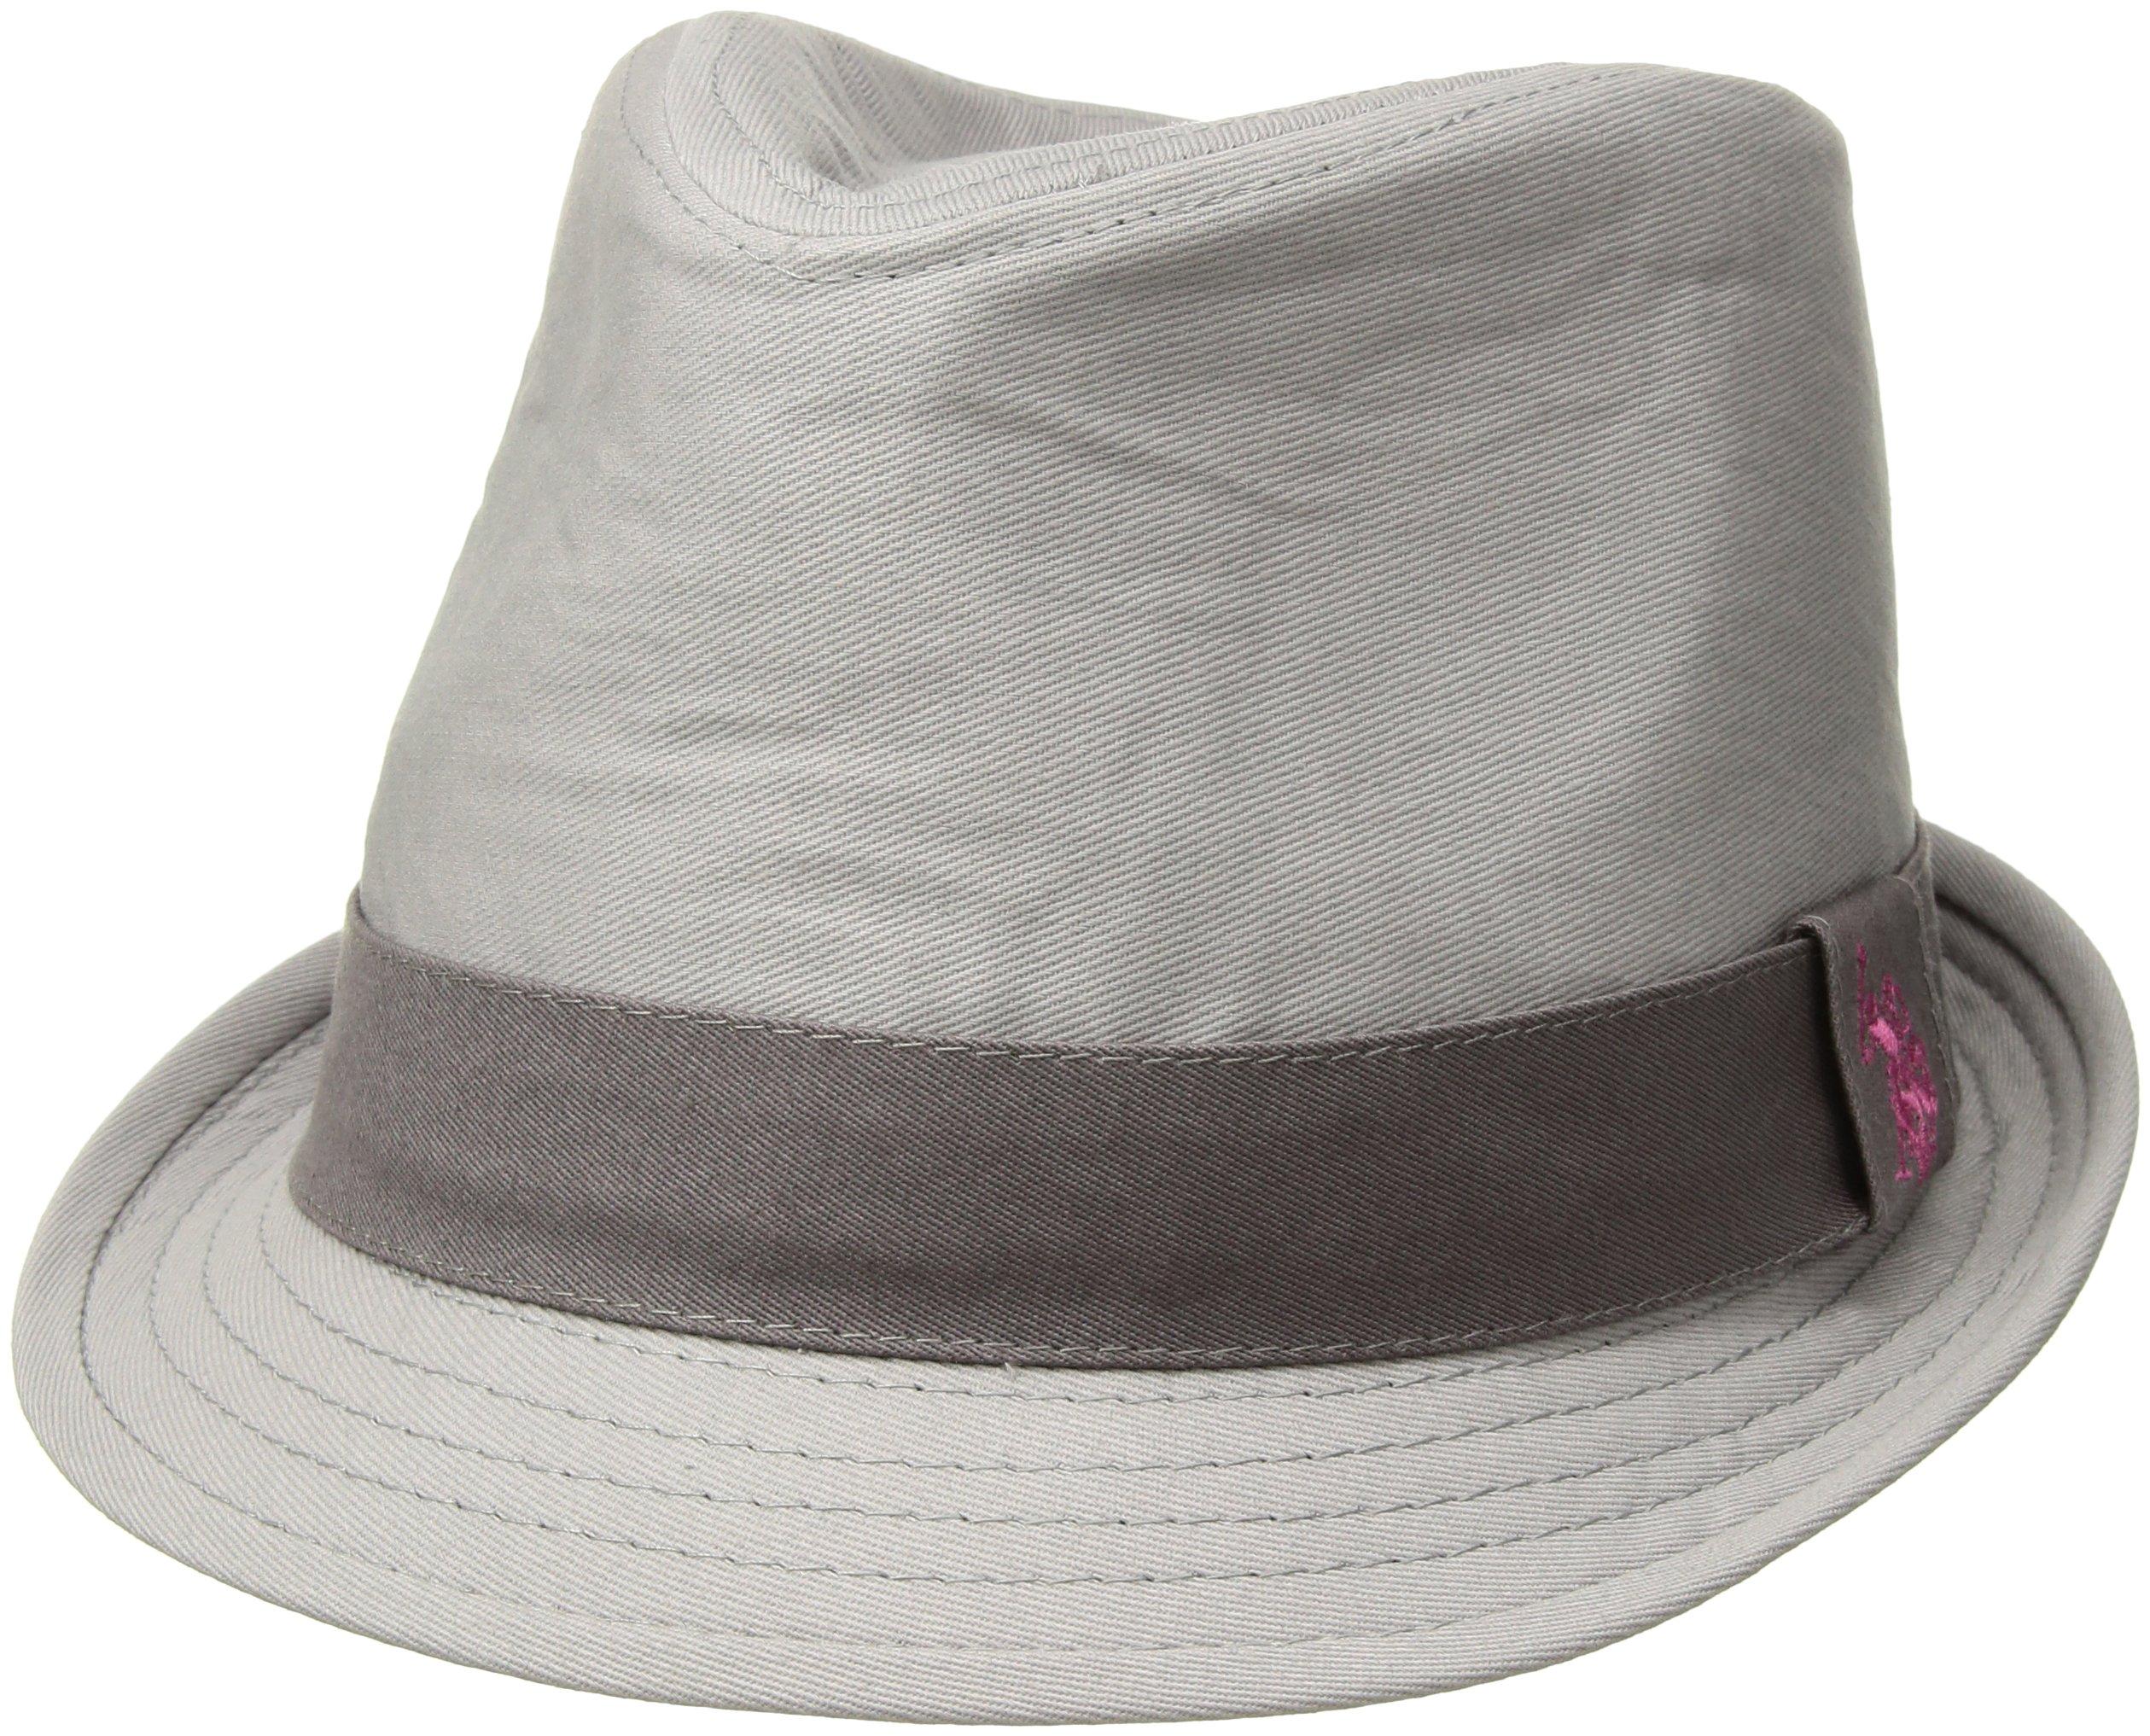 U.S. Polo Assn. Women's Tonal Twill Fedora Hat, Light Grey, One Size